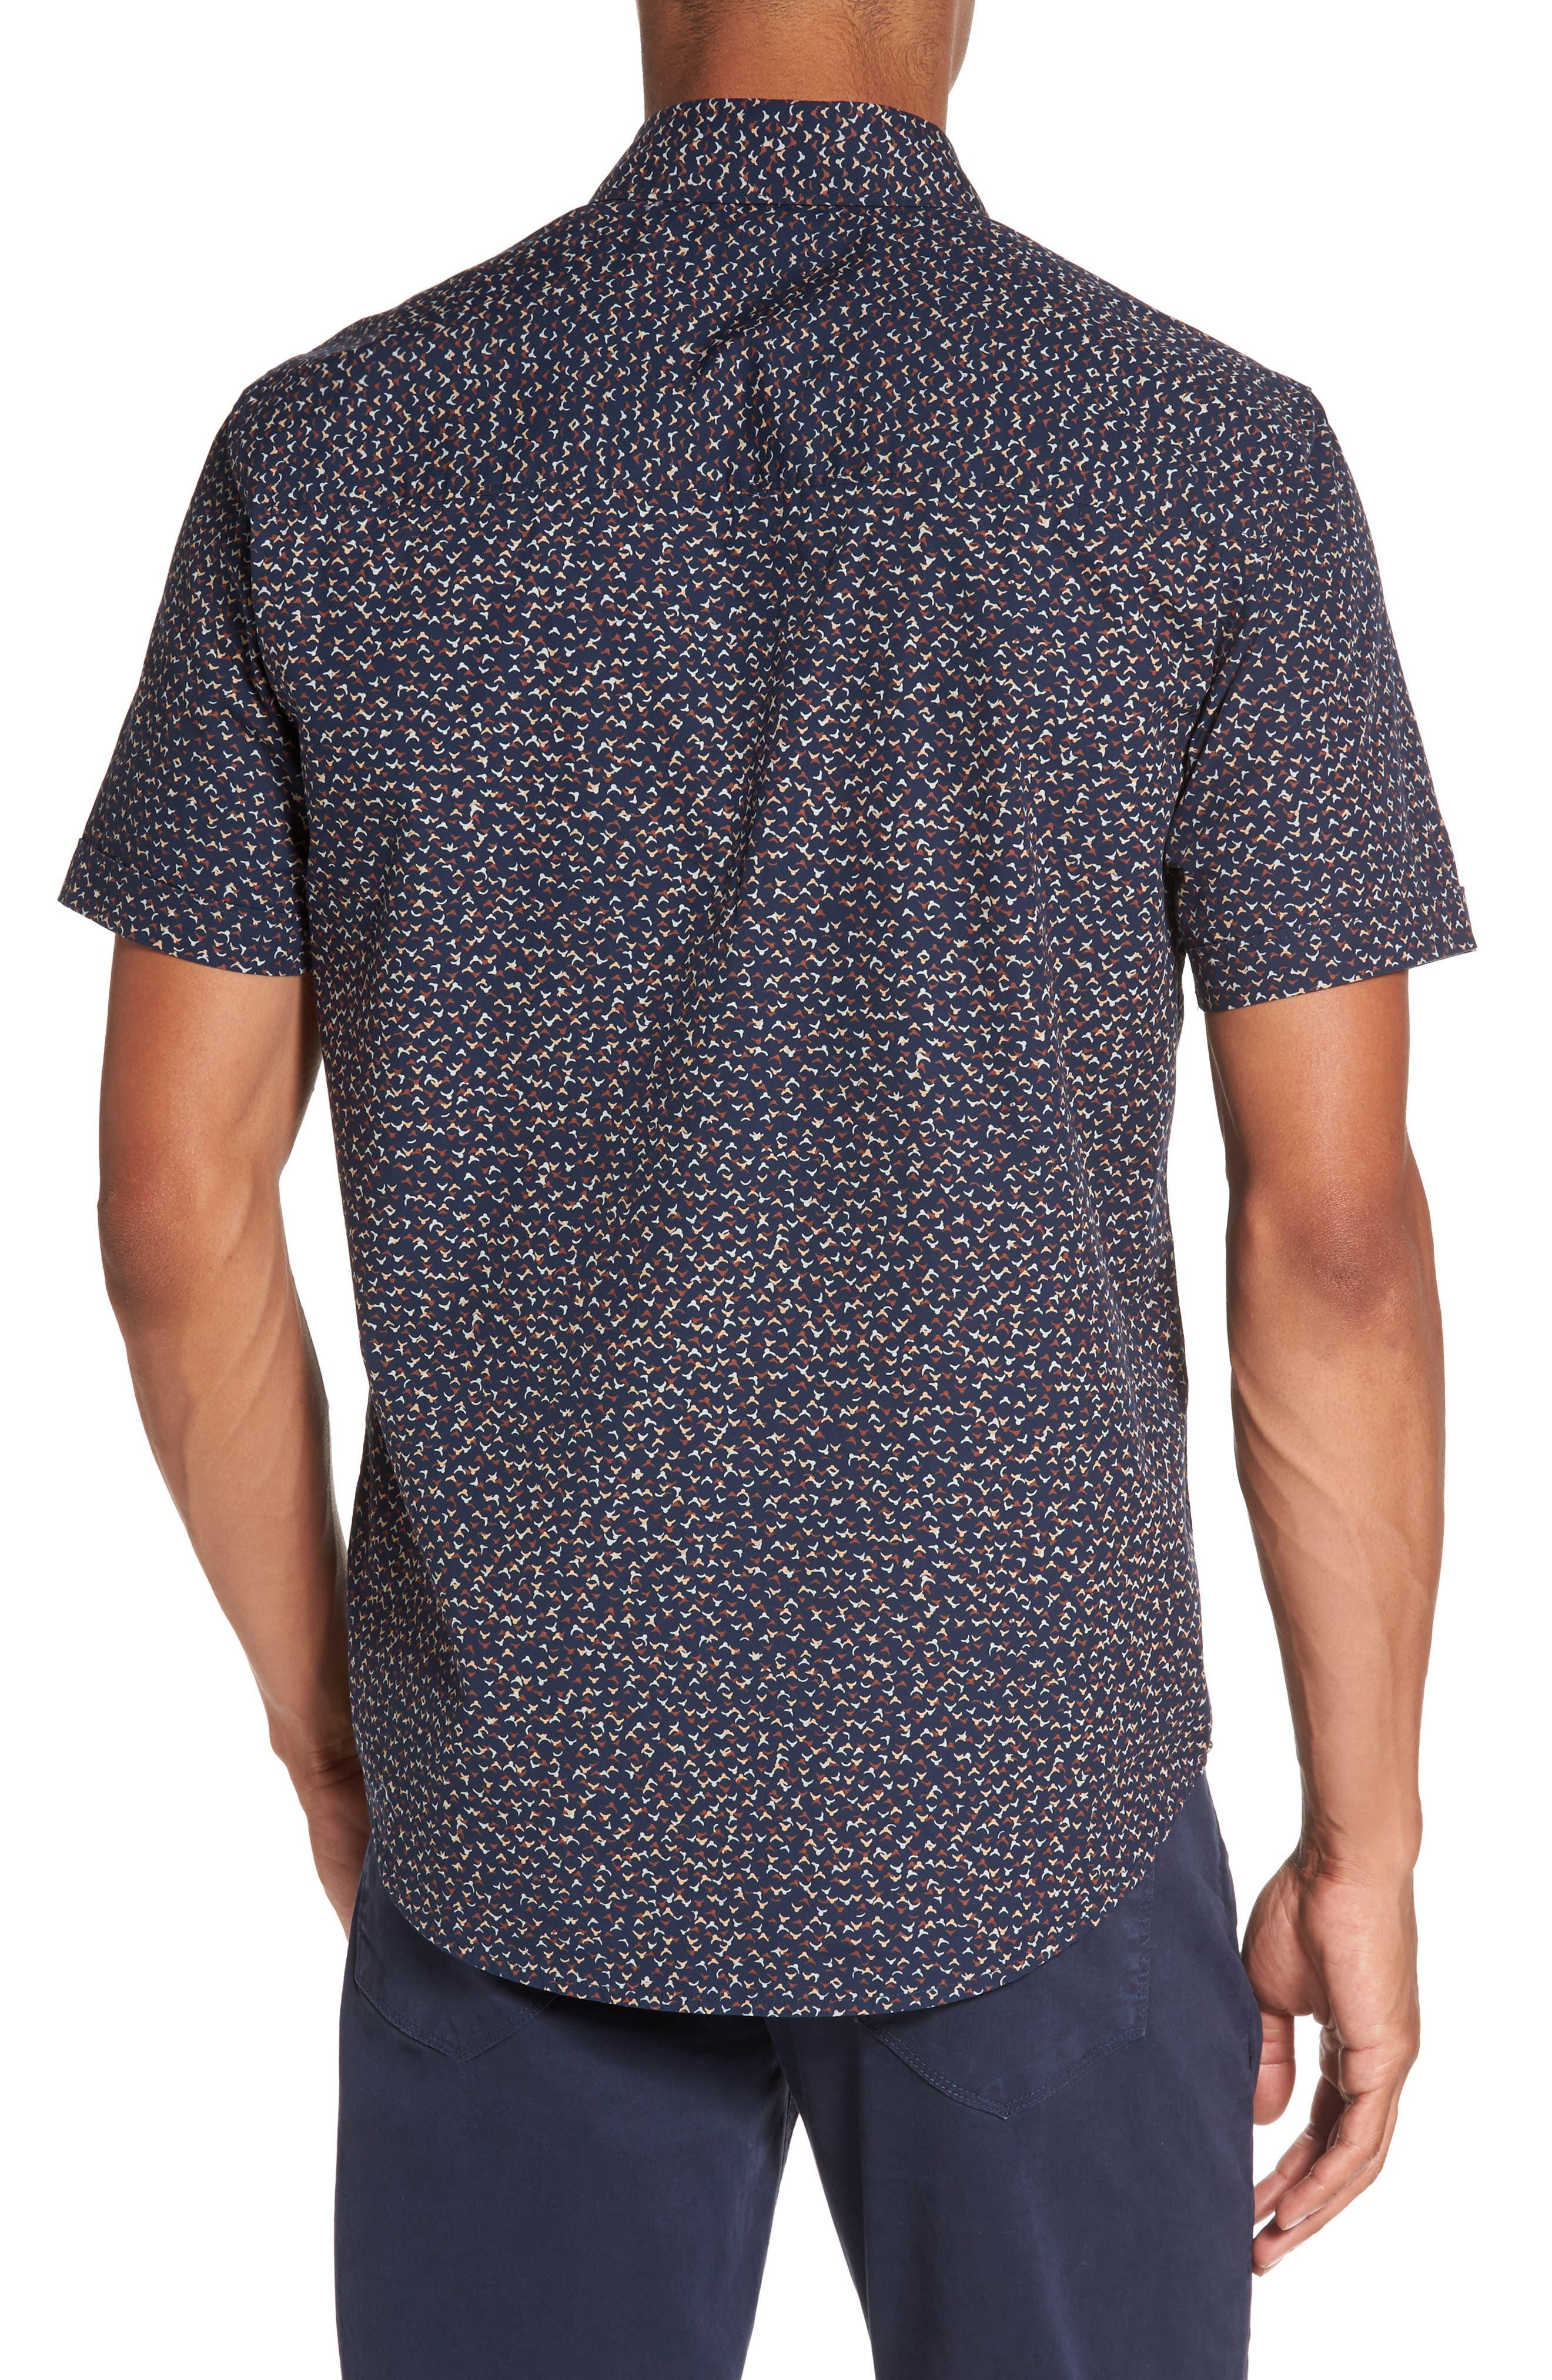 Alternate Image 2  - PAIGE Becker Patterned Woven Shirt